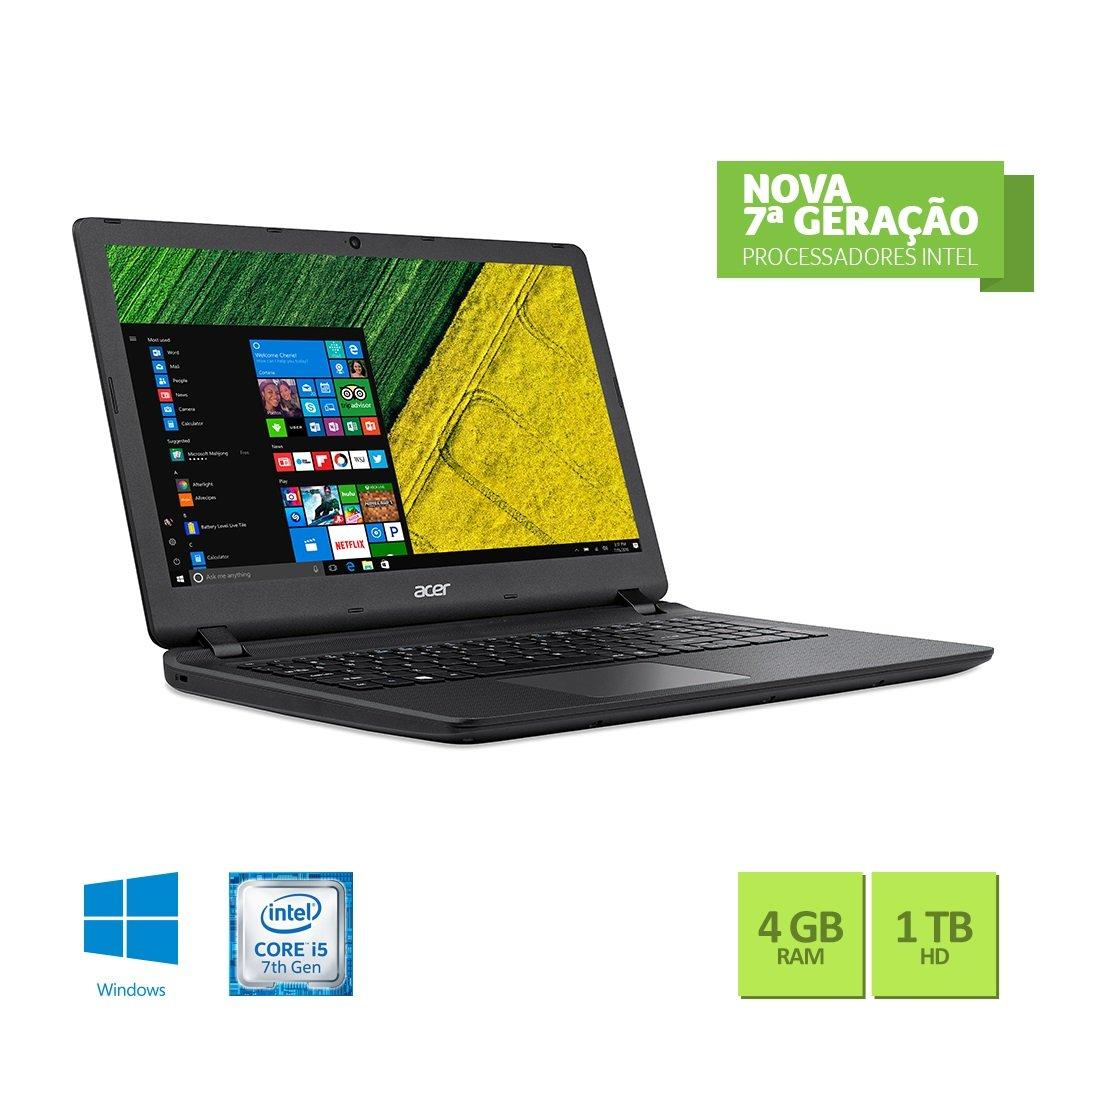 Notebook Acer Aspire-Es1-572-51Nj-Core I5 7200U